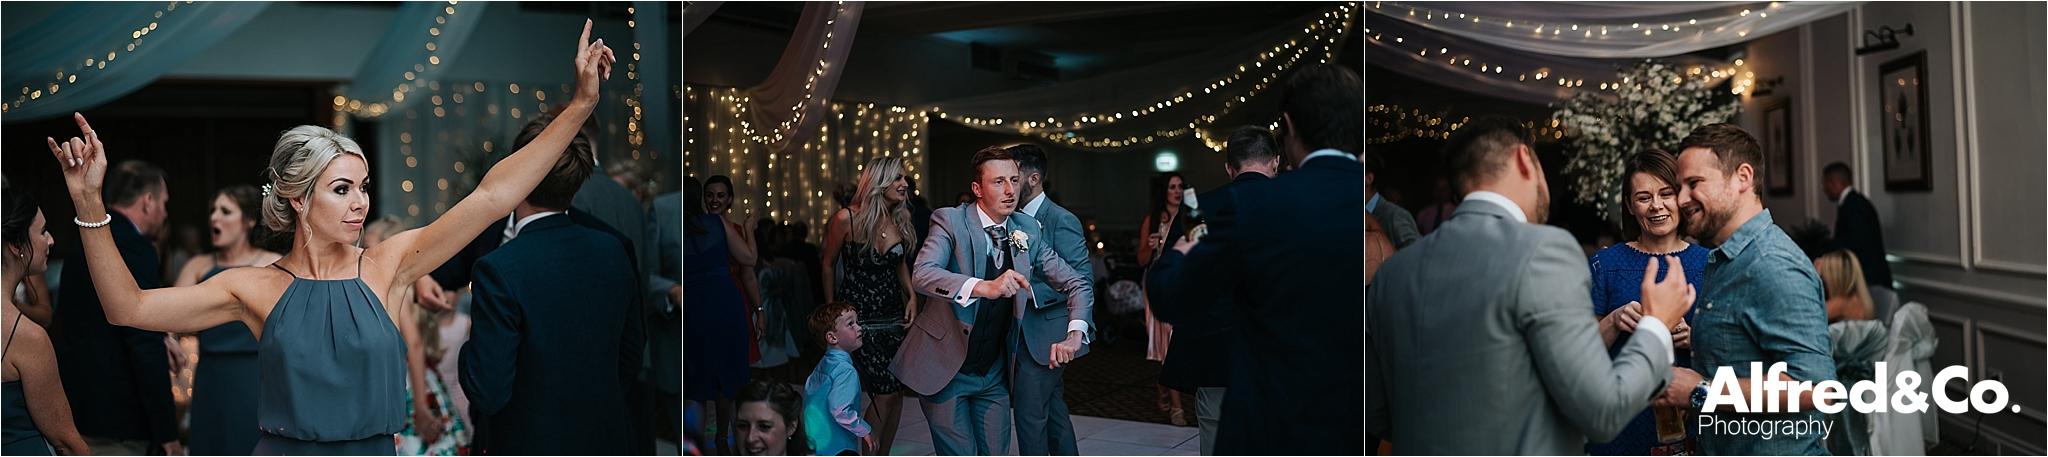 Dunkenalgh wedding photographer, lancashire